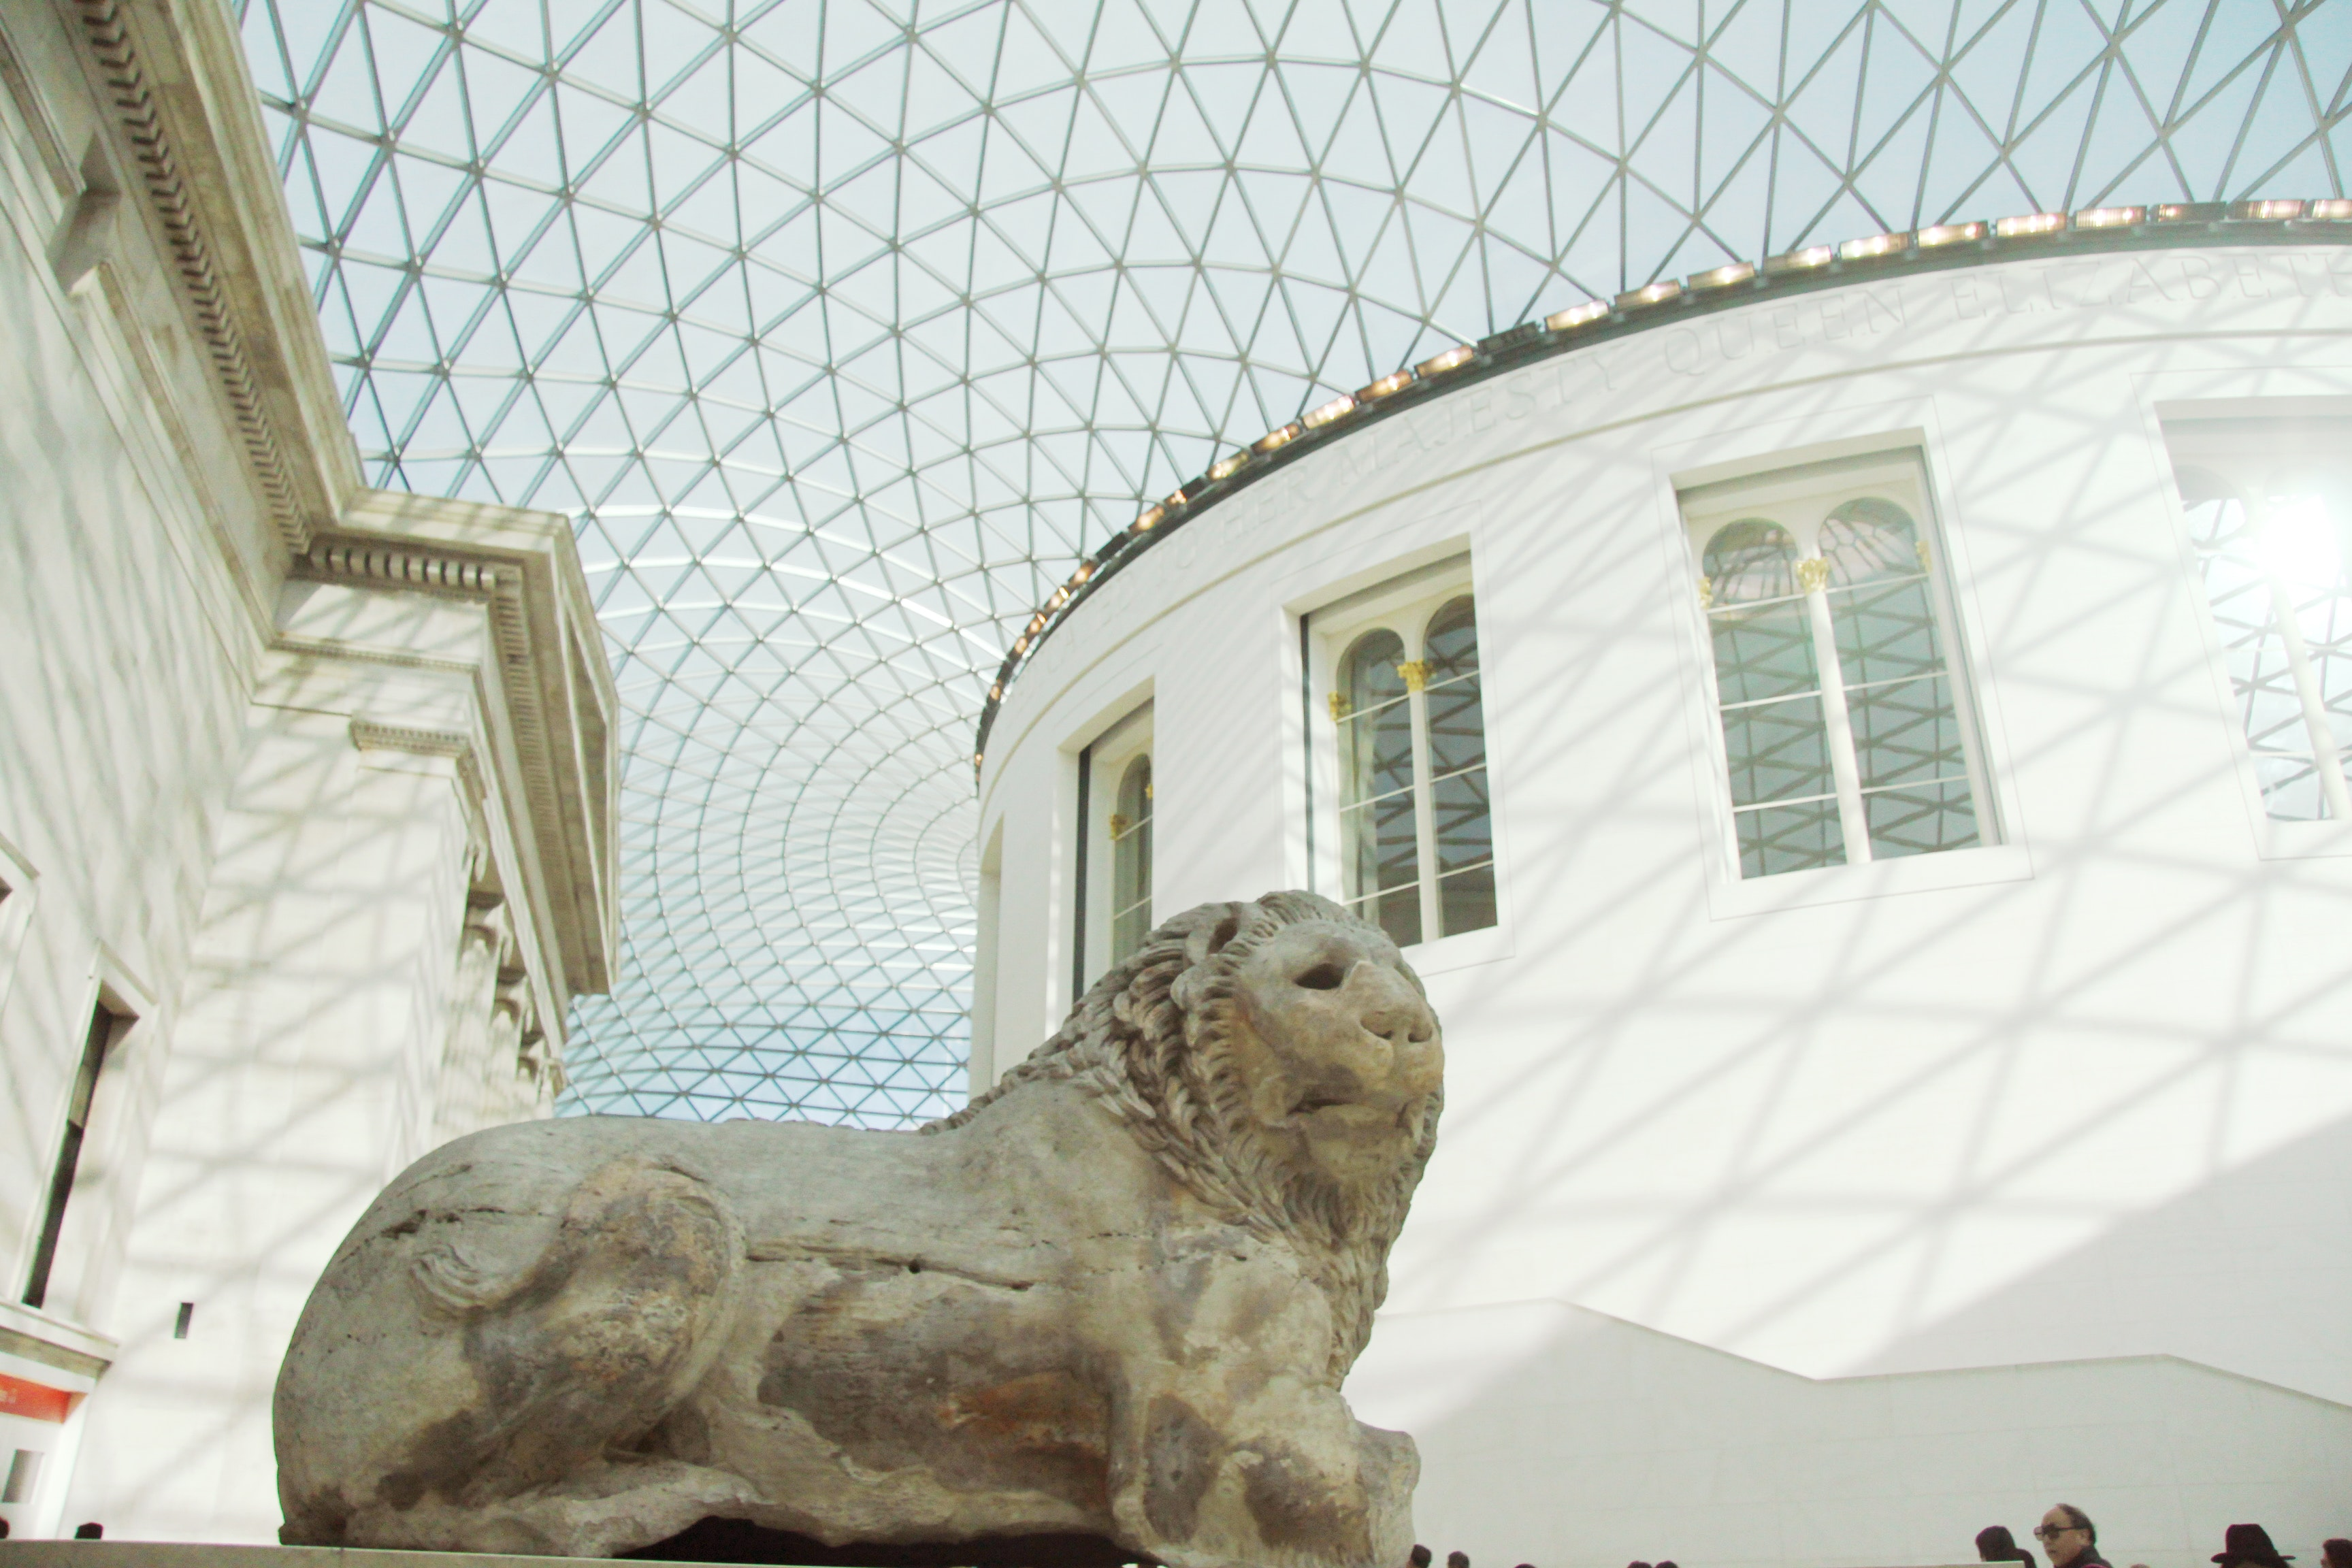 Gray animal statue inside building photo